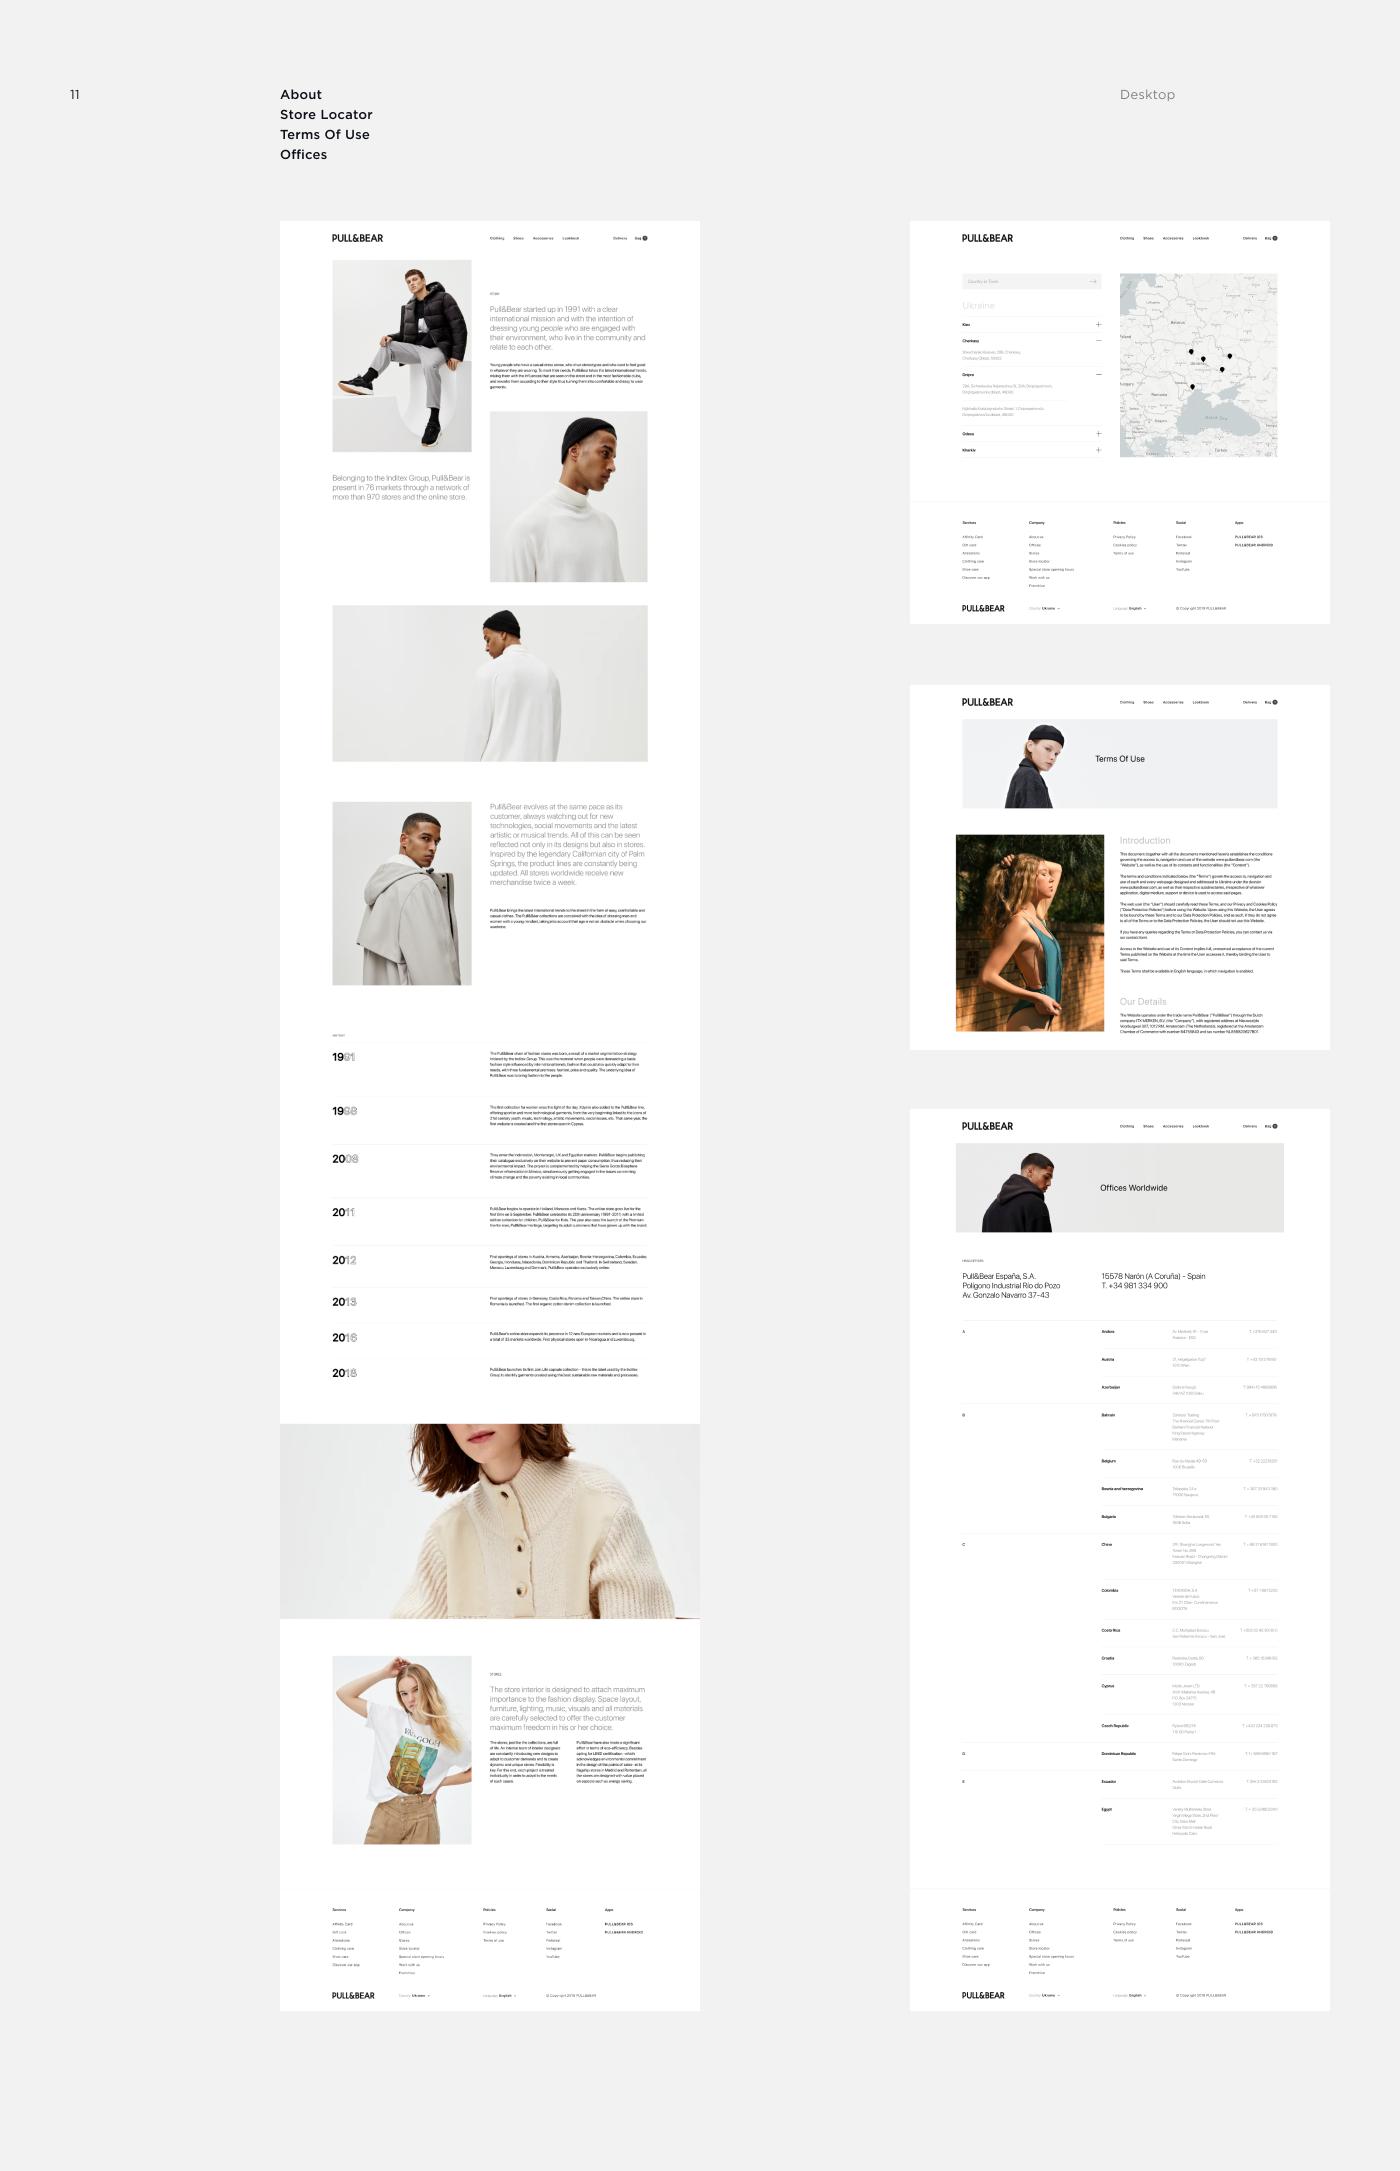 Adobe XD Figma Adobe Photoshop Fashion  store Ecommerce online store UI/UX Web Design  Website